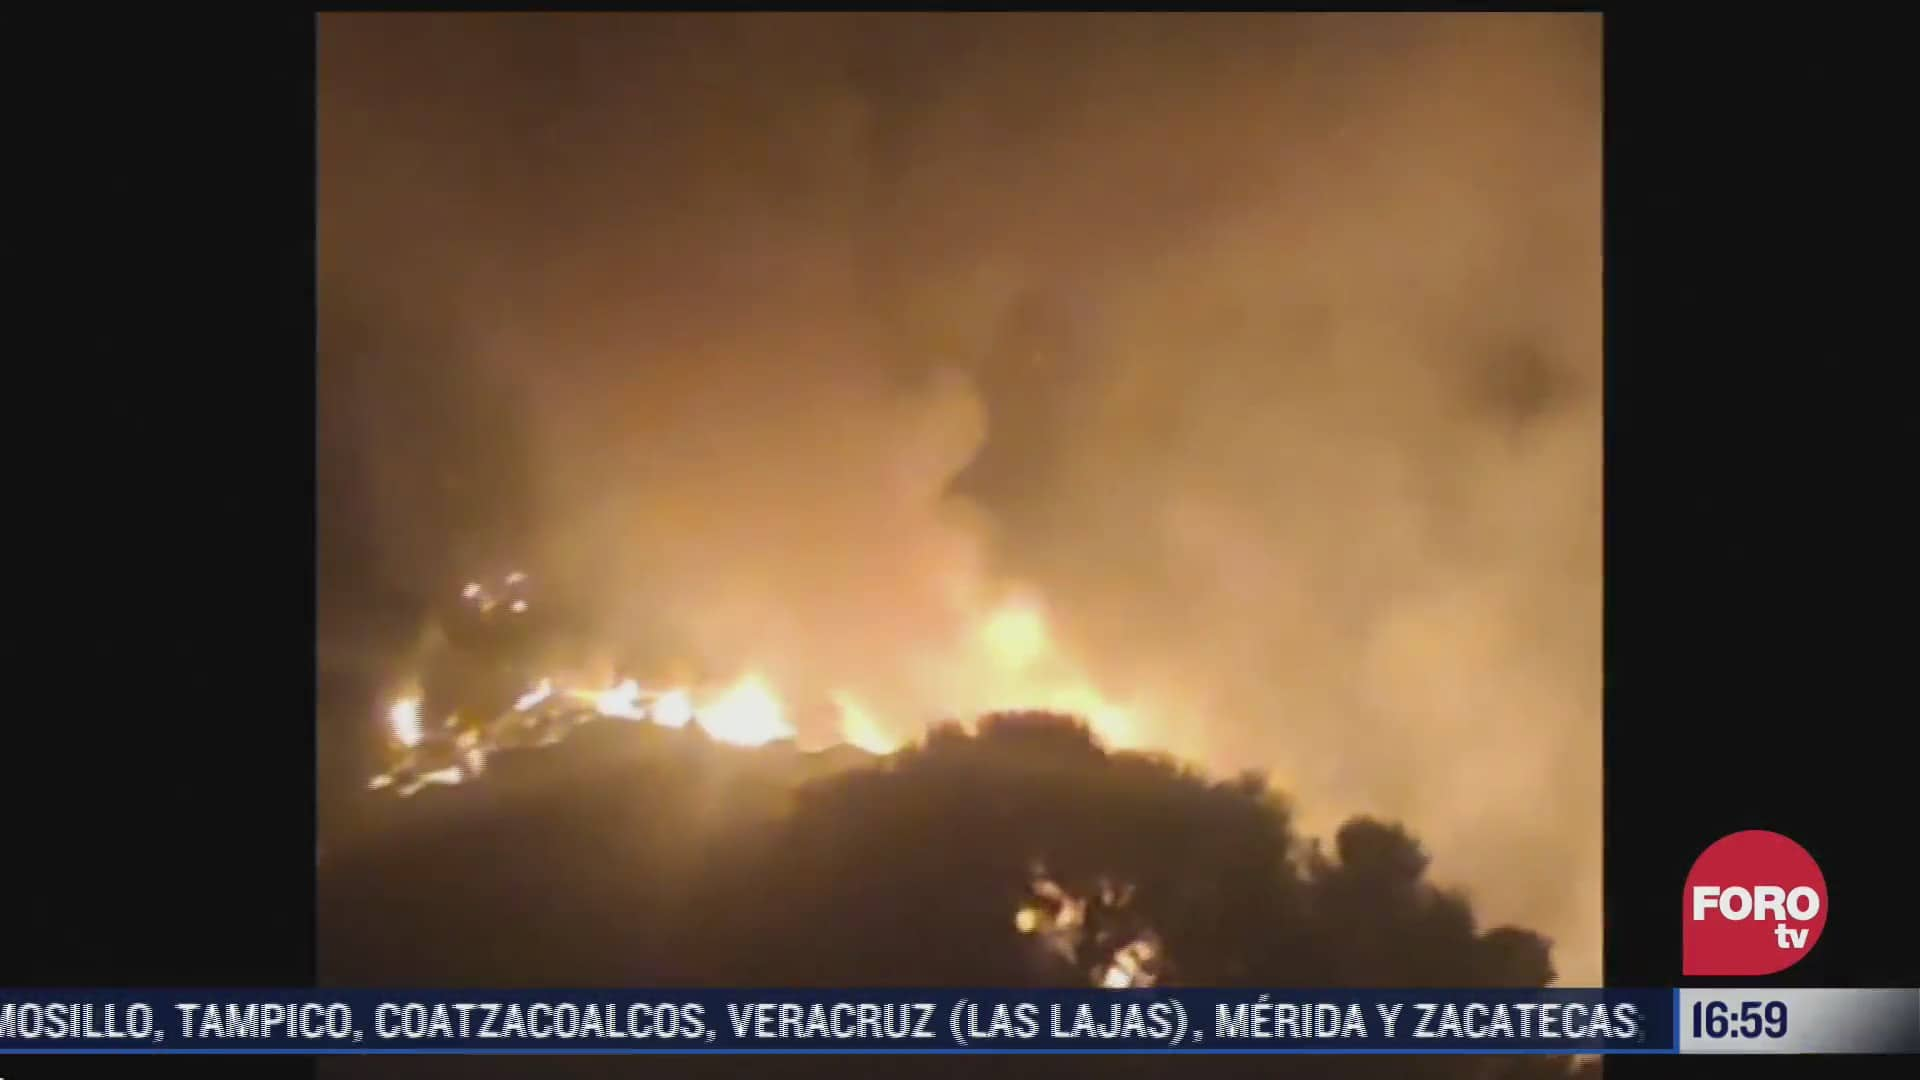 incendio consume mas de 6 mil hectareas de bosque